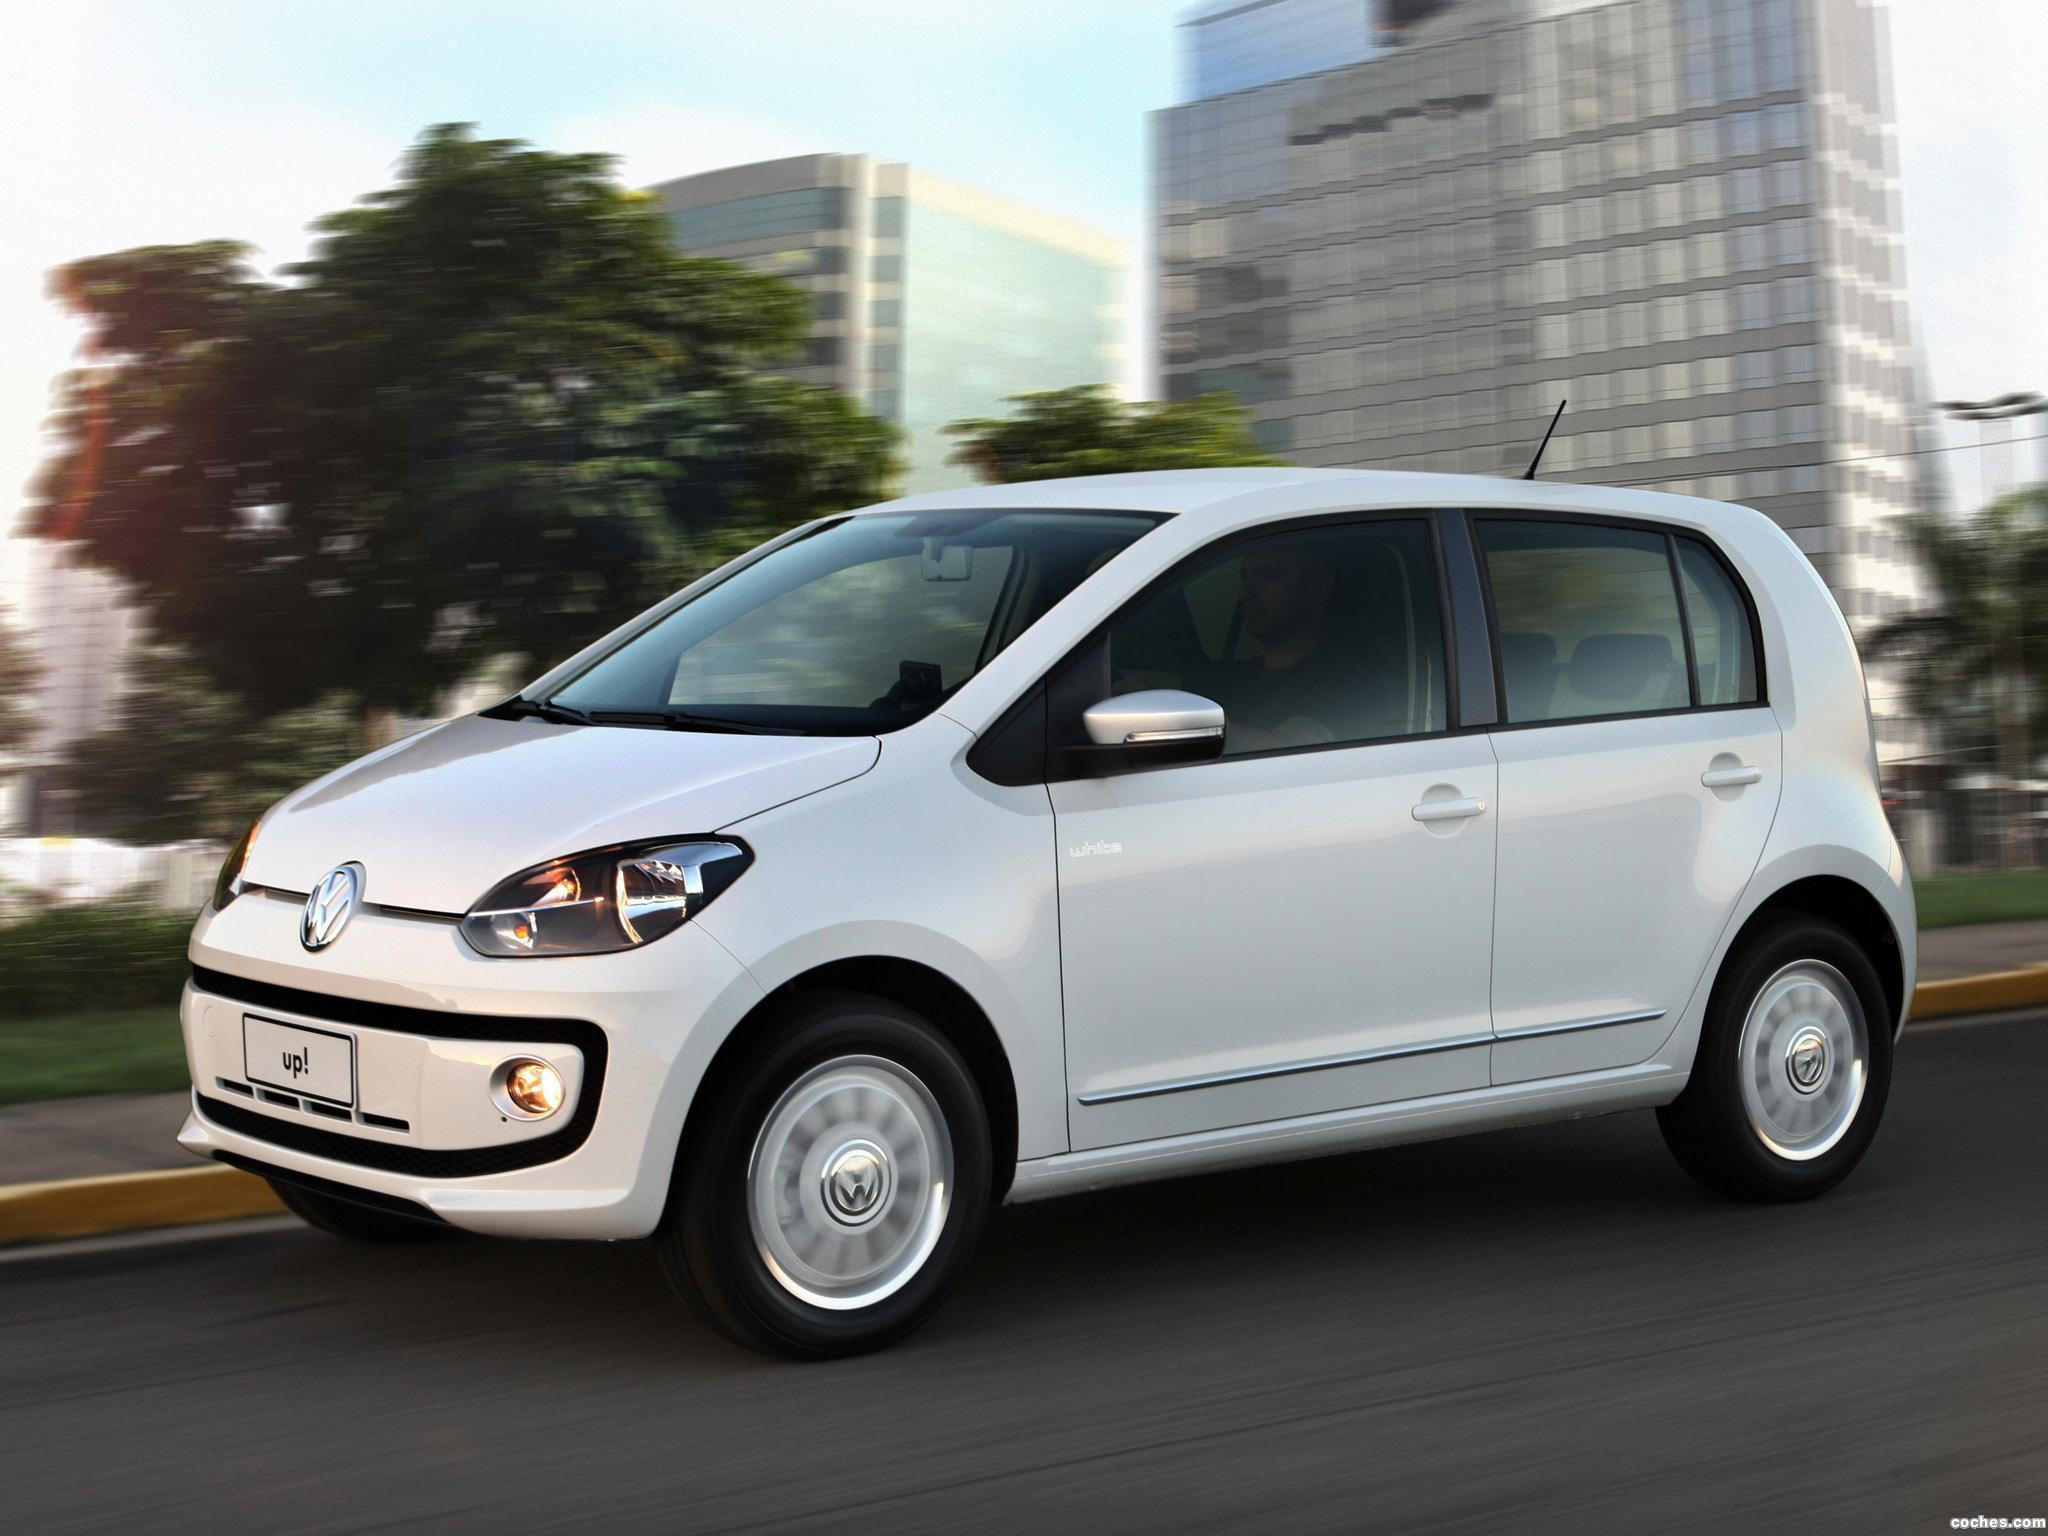 Foto 0 de Volkswagen Up! White Brasil 2014